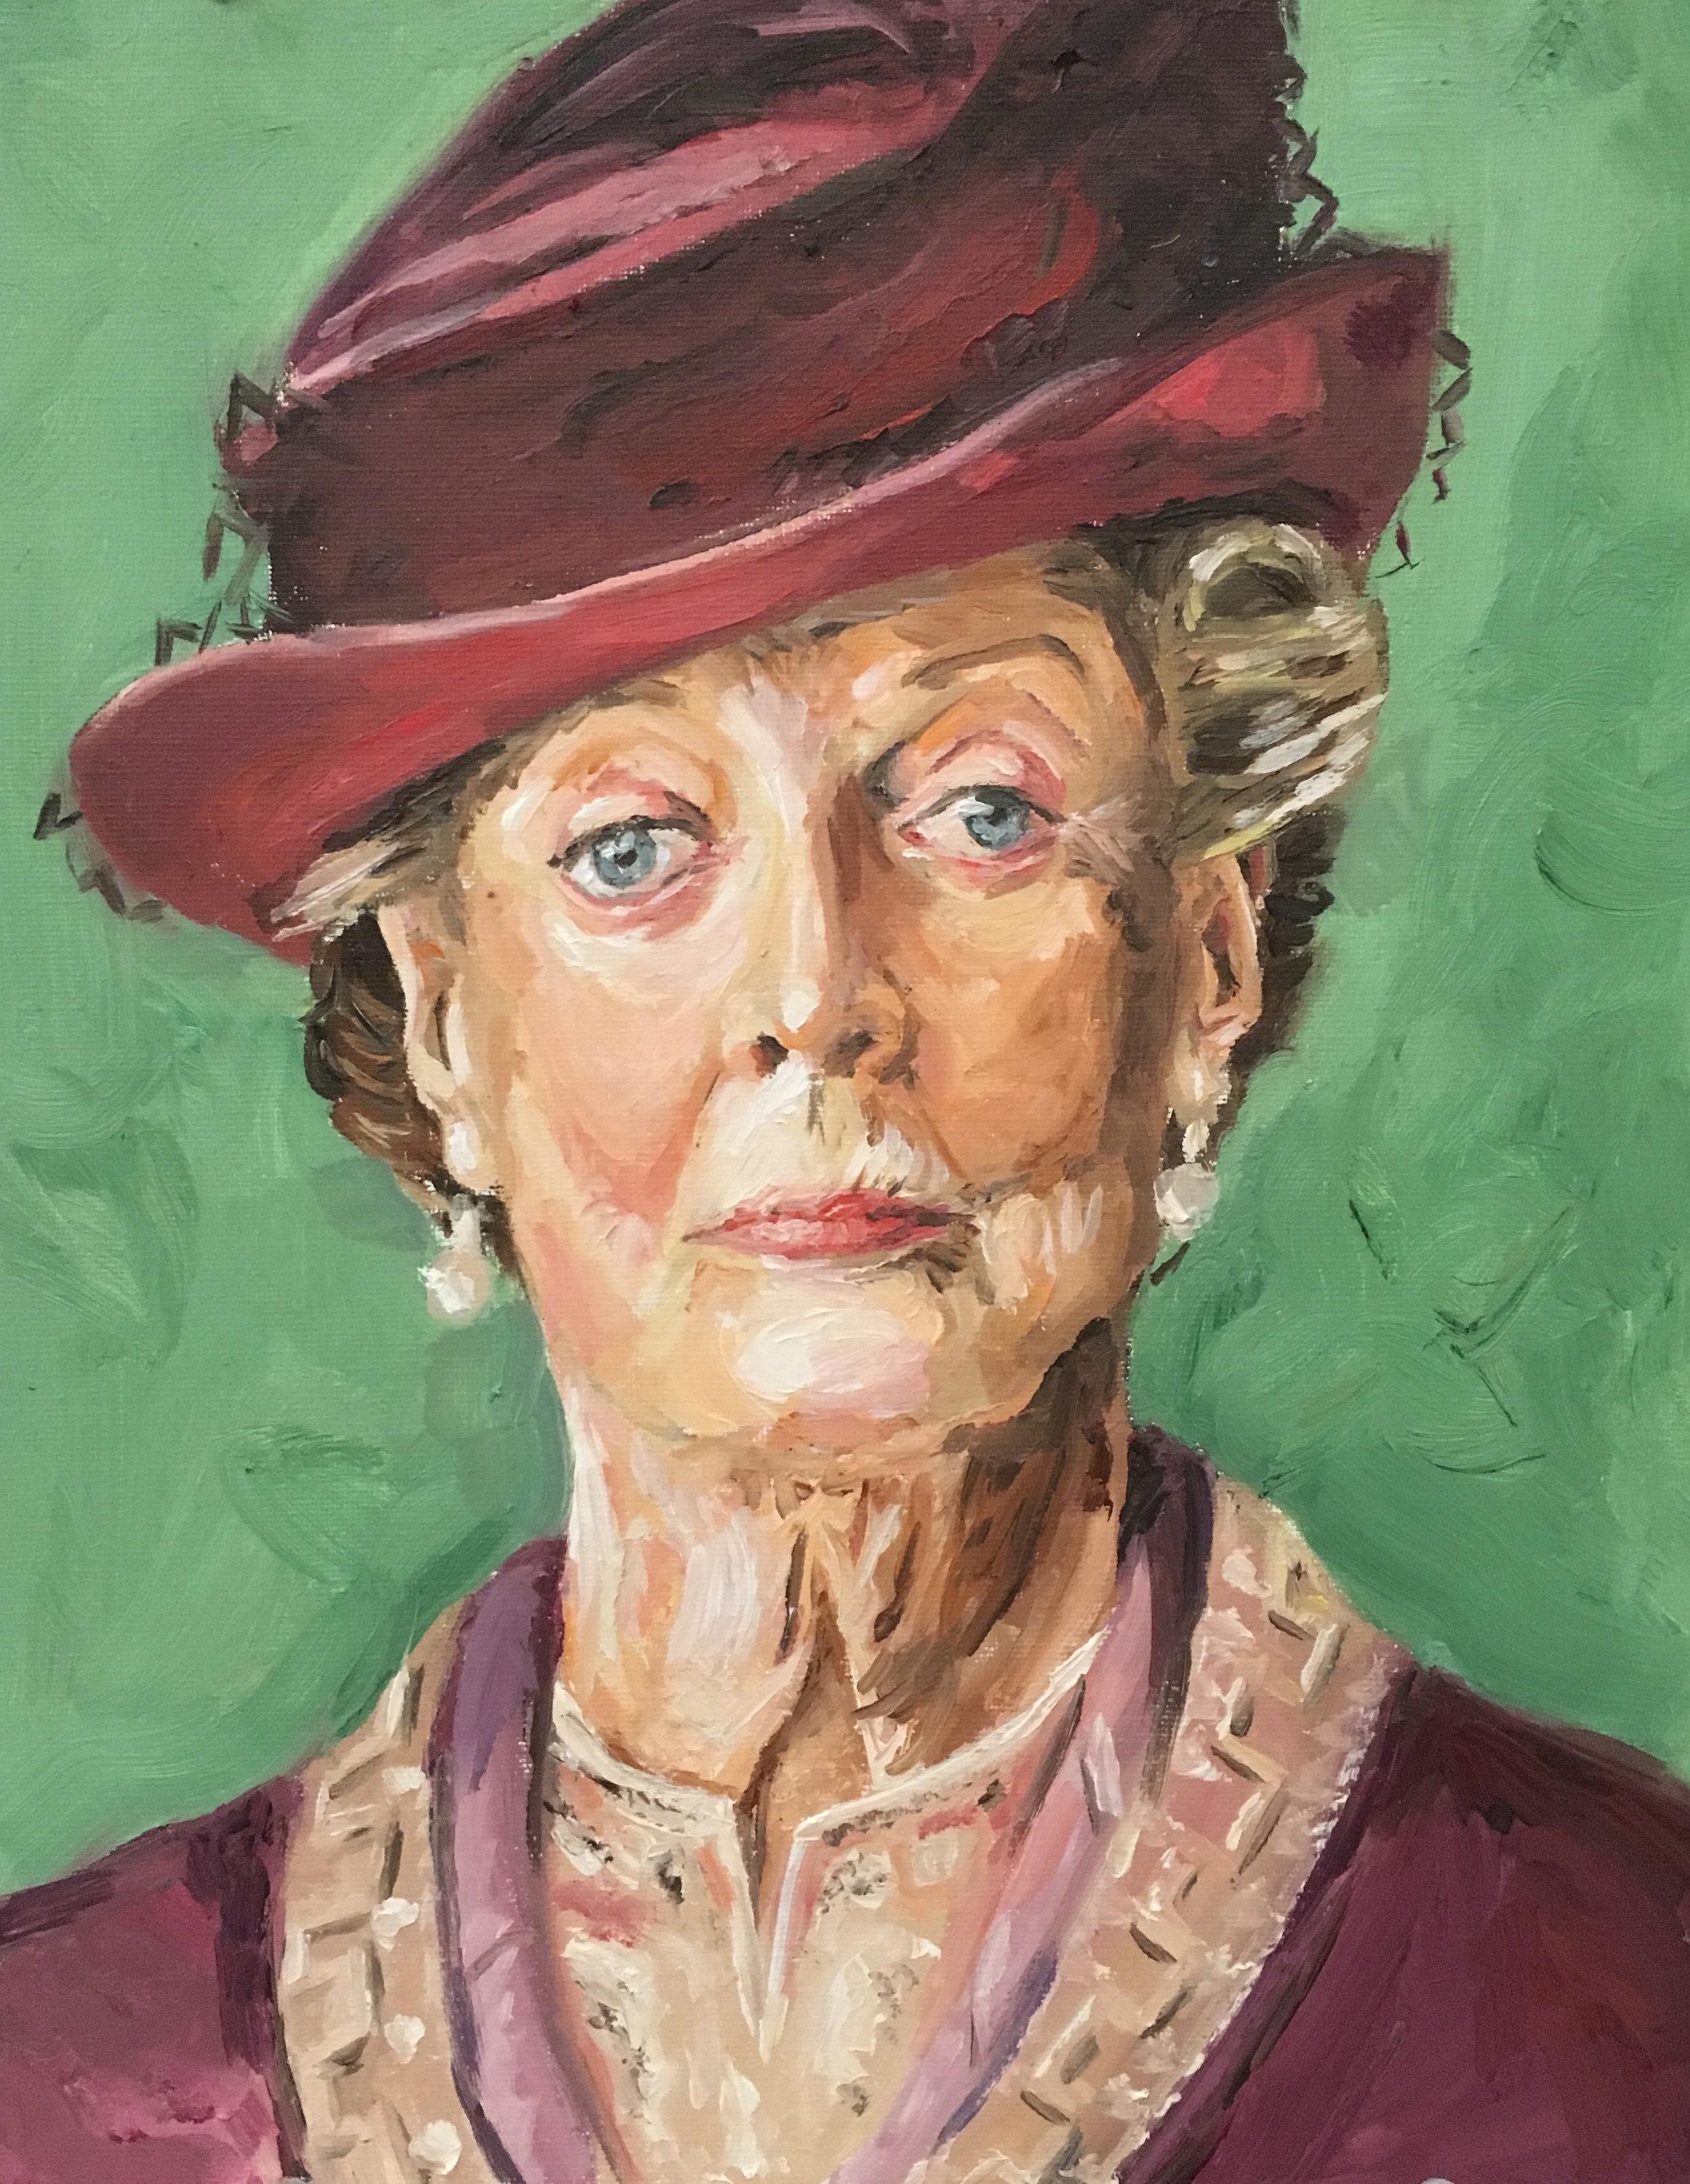 Maggie Smith - Oil on canvas-board, 11 x 14'